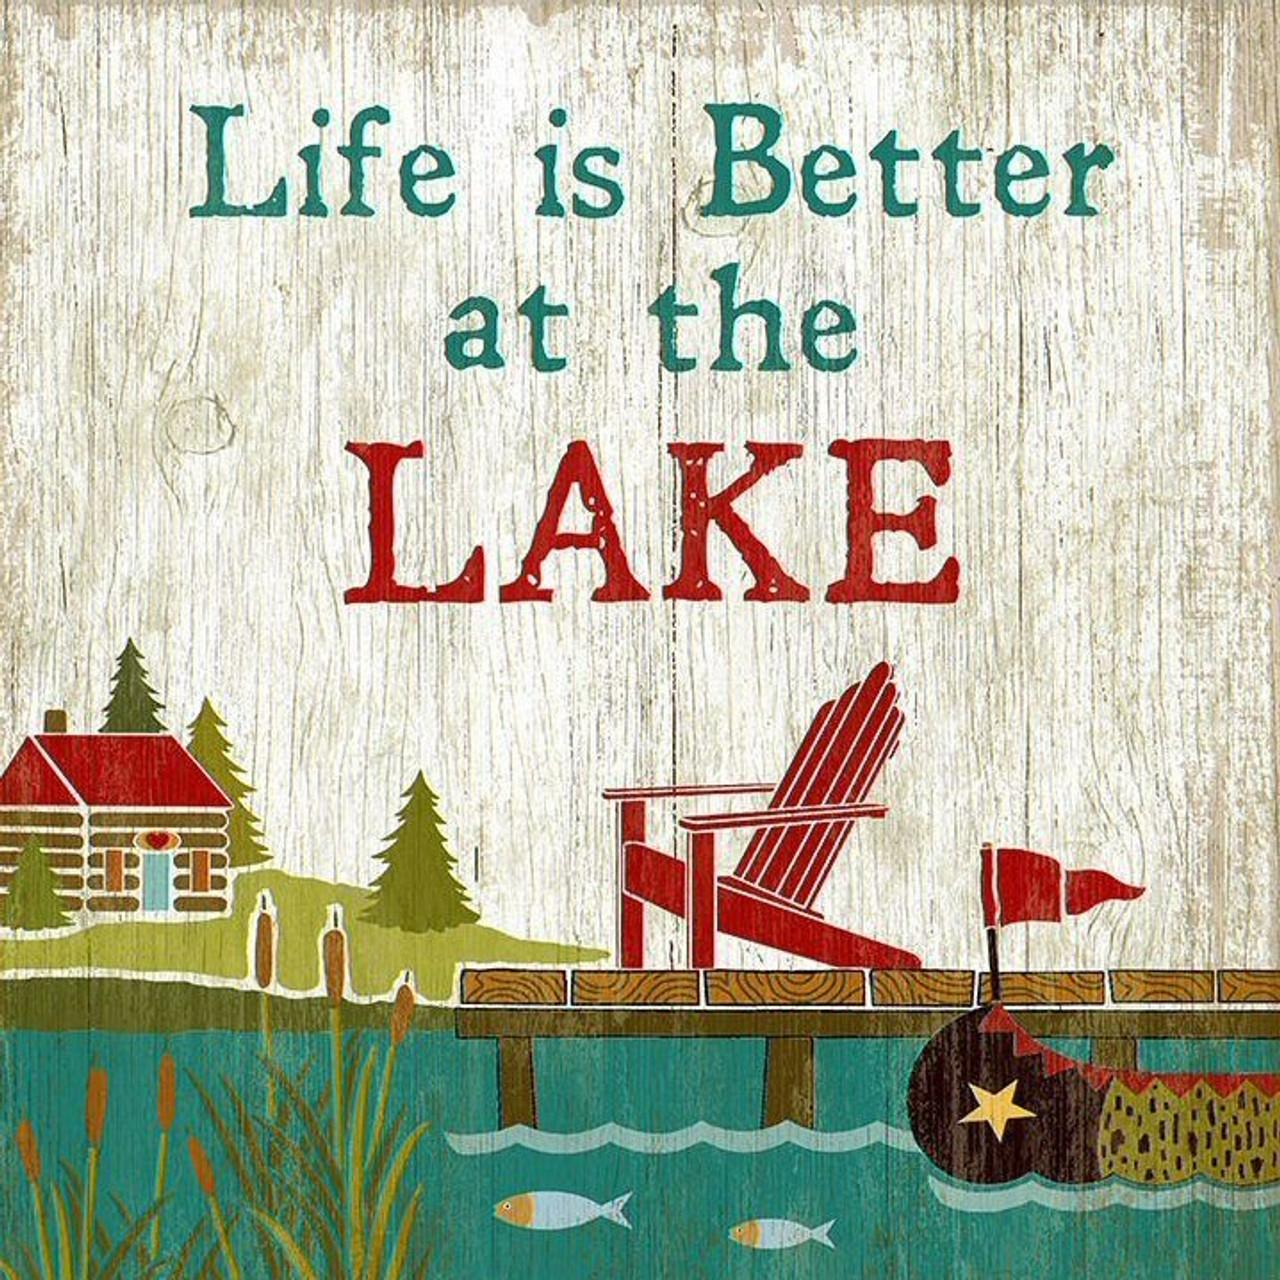 Lake Wood Signs